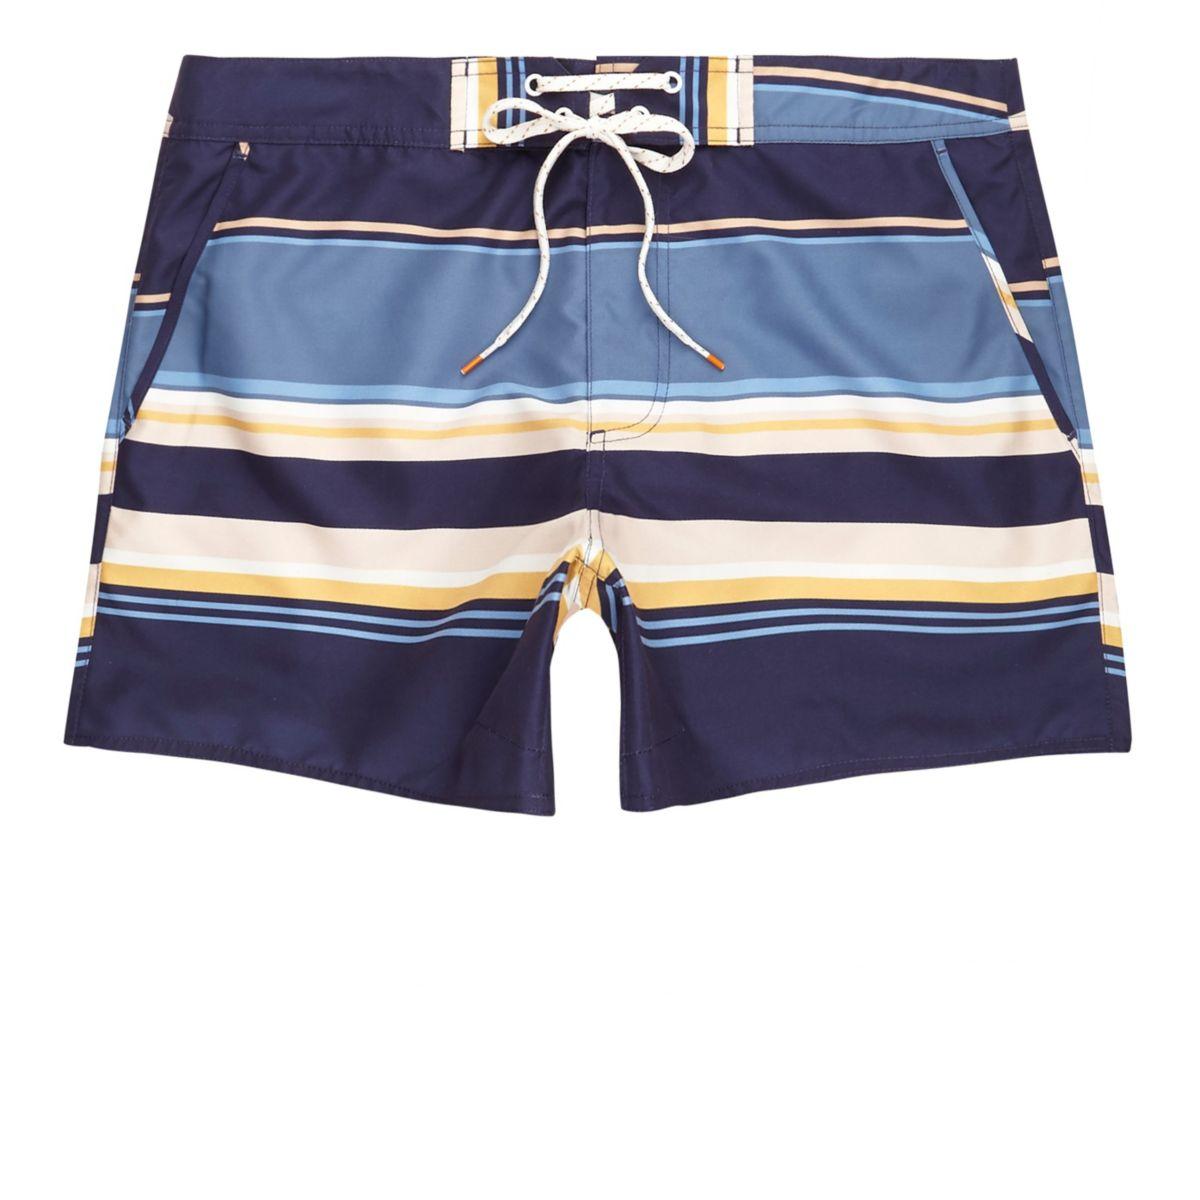 Blue multi stripe swim trunks